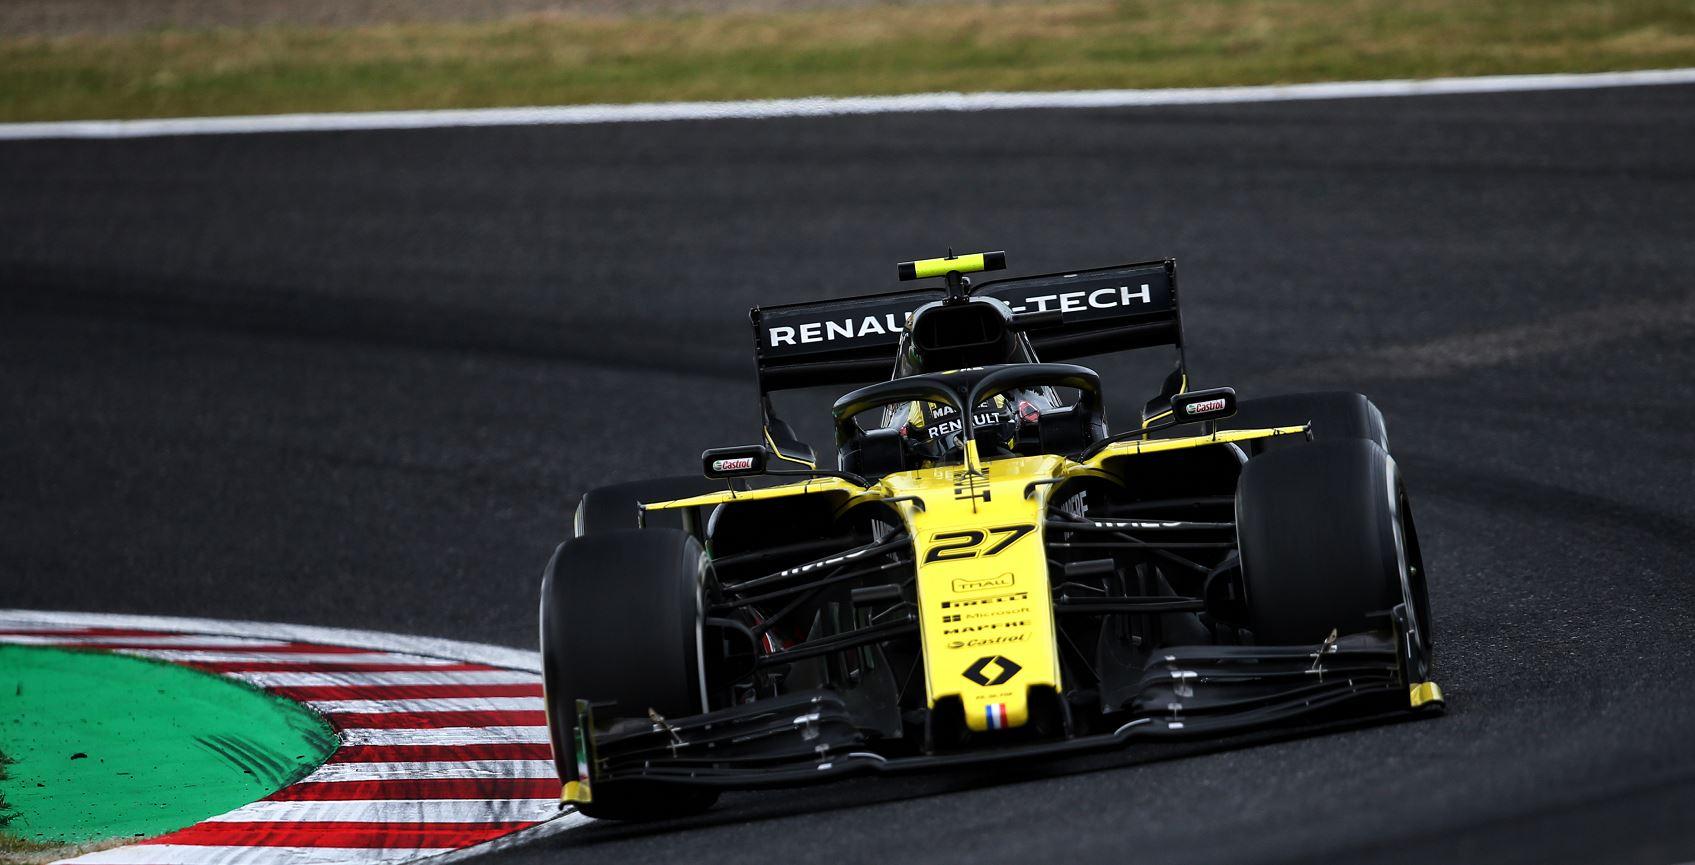 Renault Nico Hülkenberg